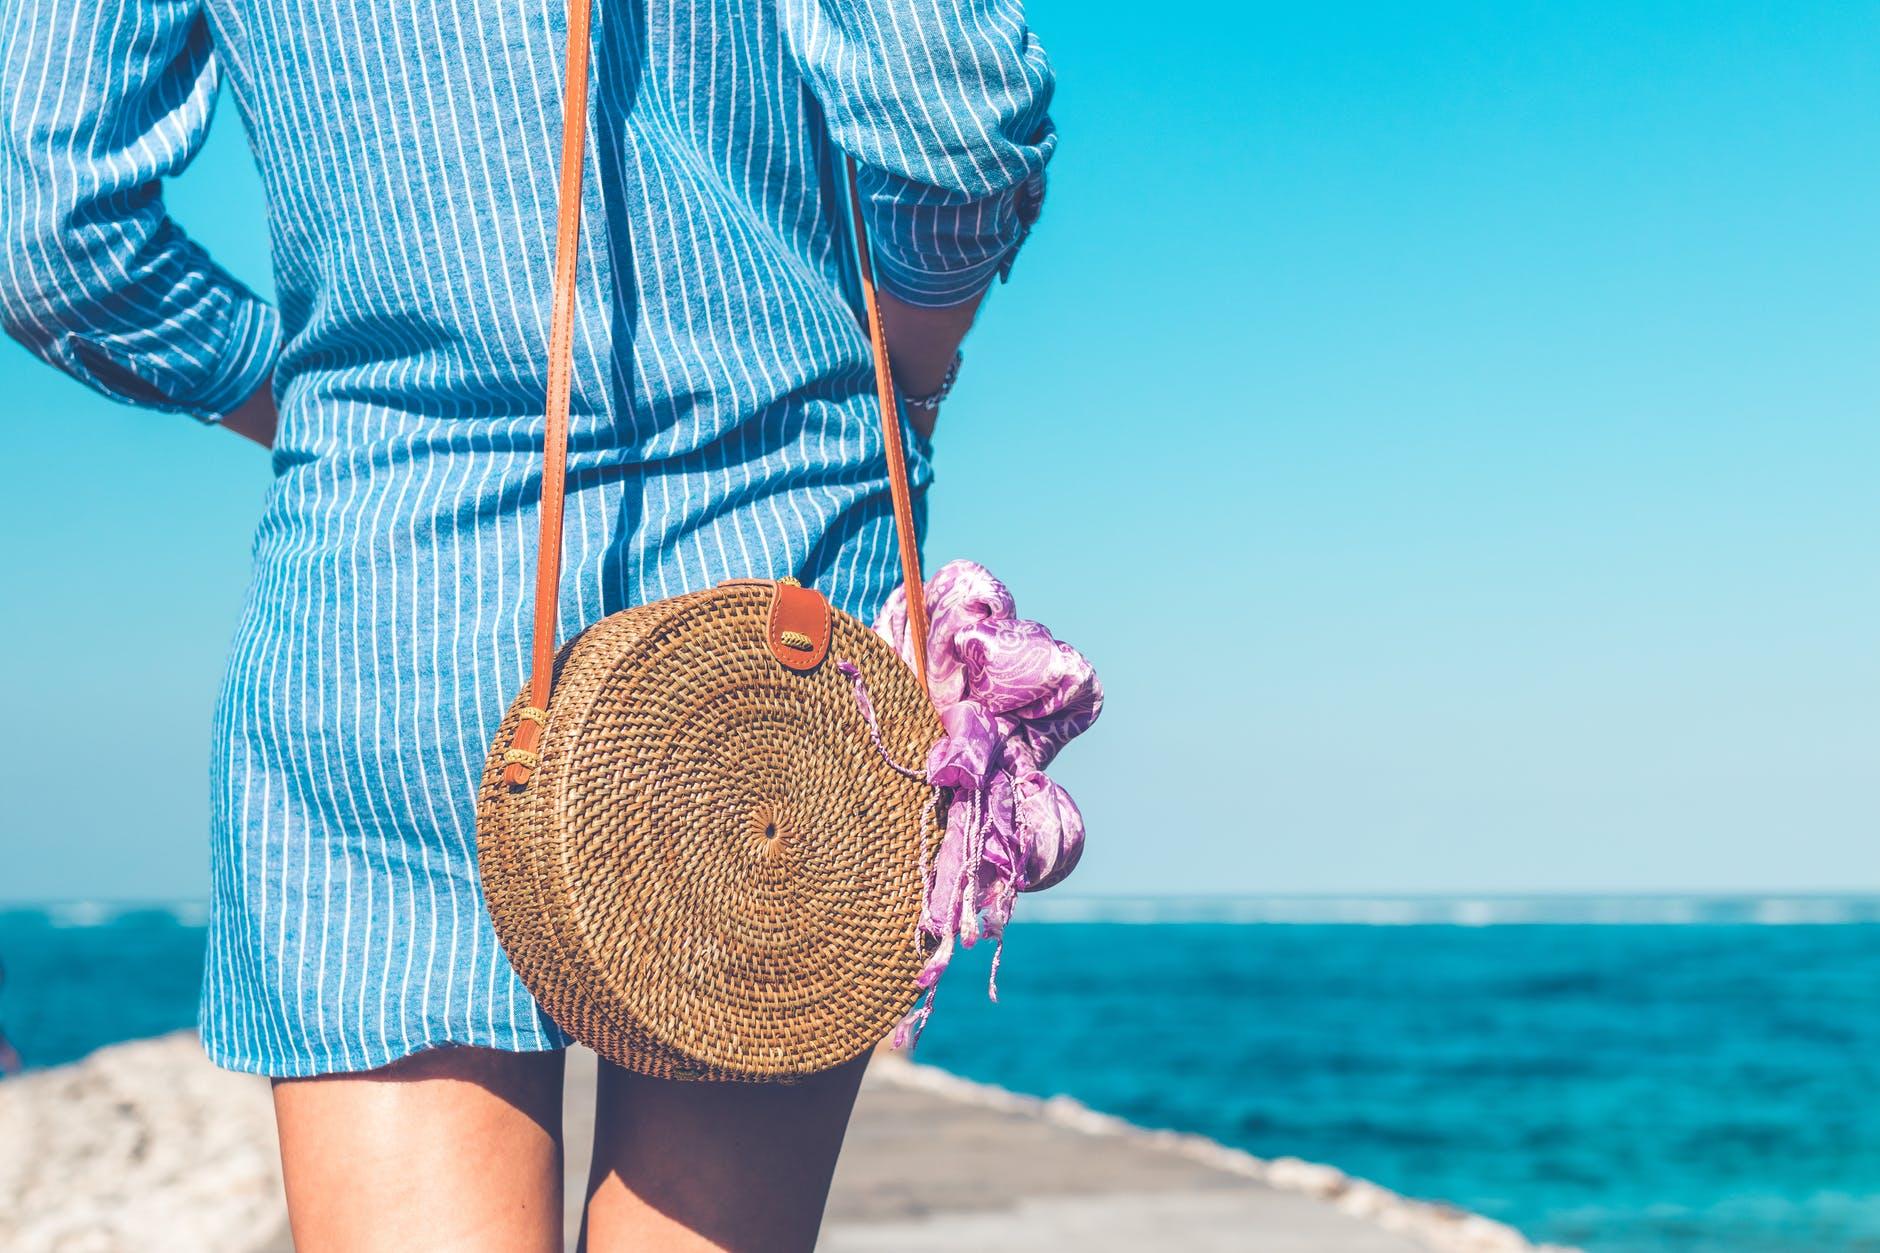 femme de dos avec sac en osier et robe en jeans